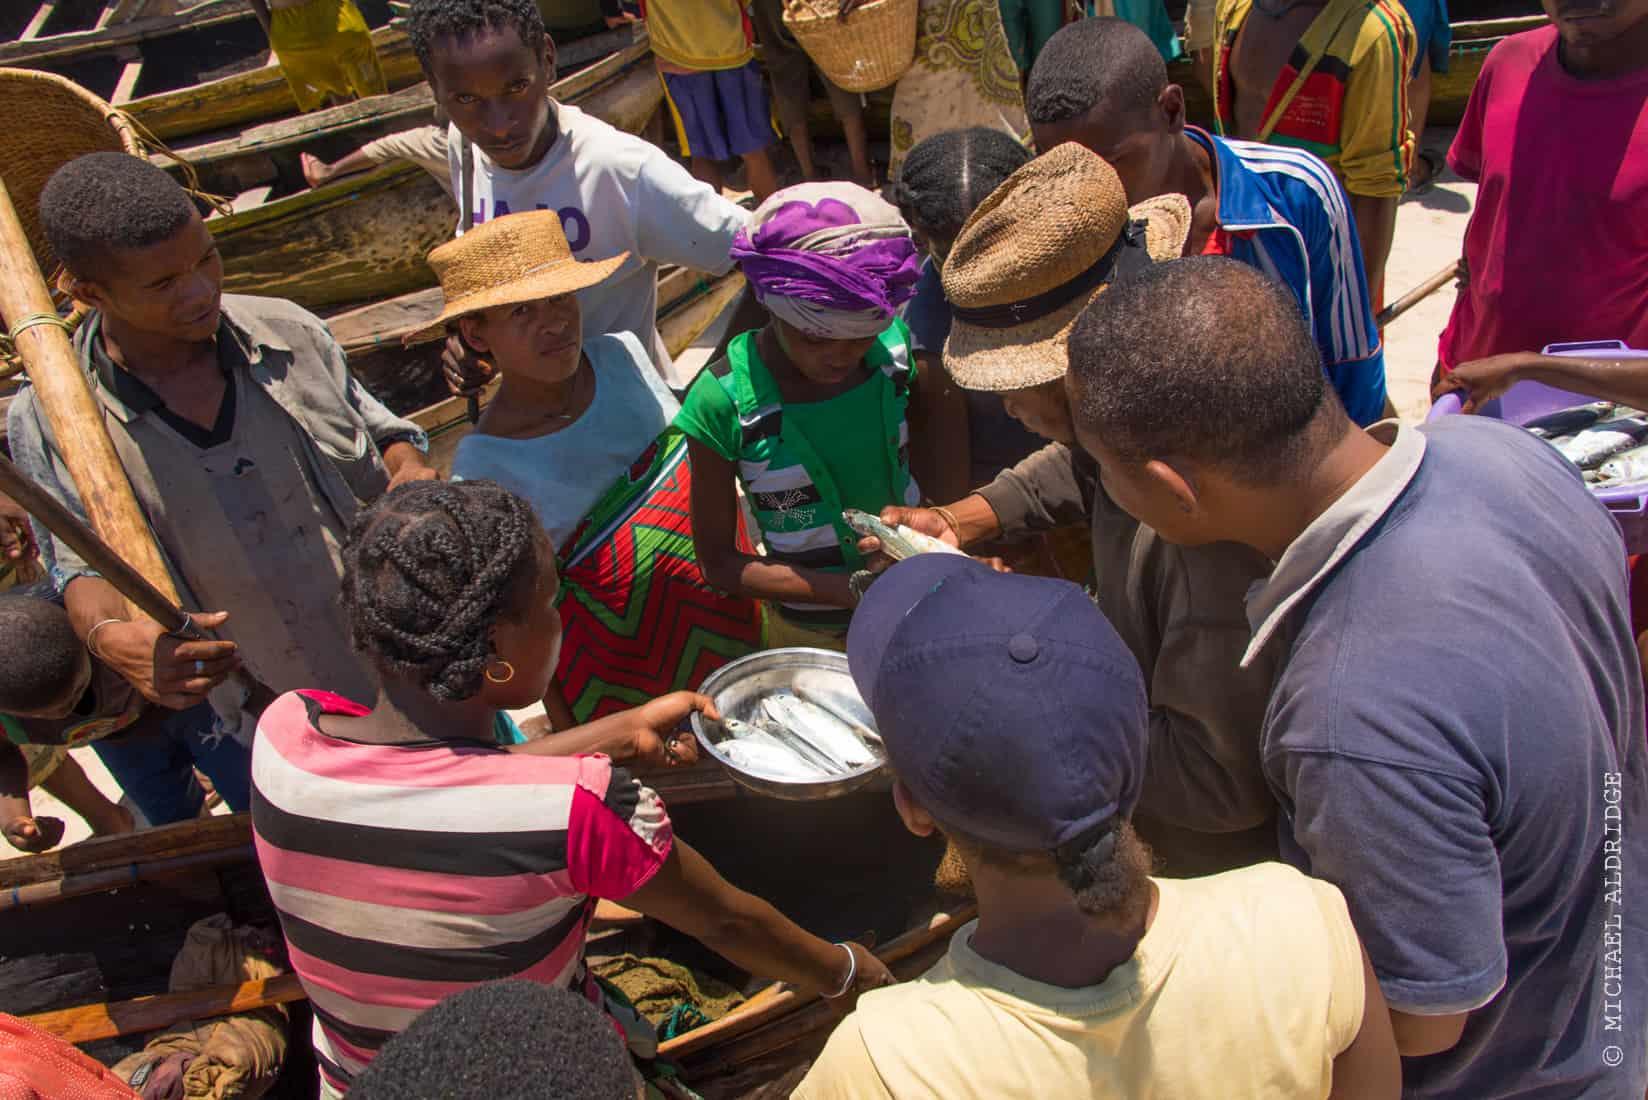 Negotiations at the fishing market